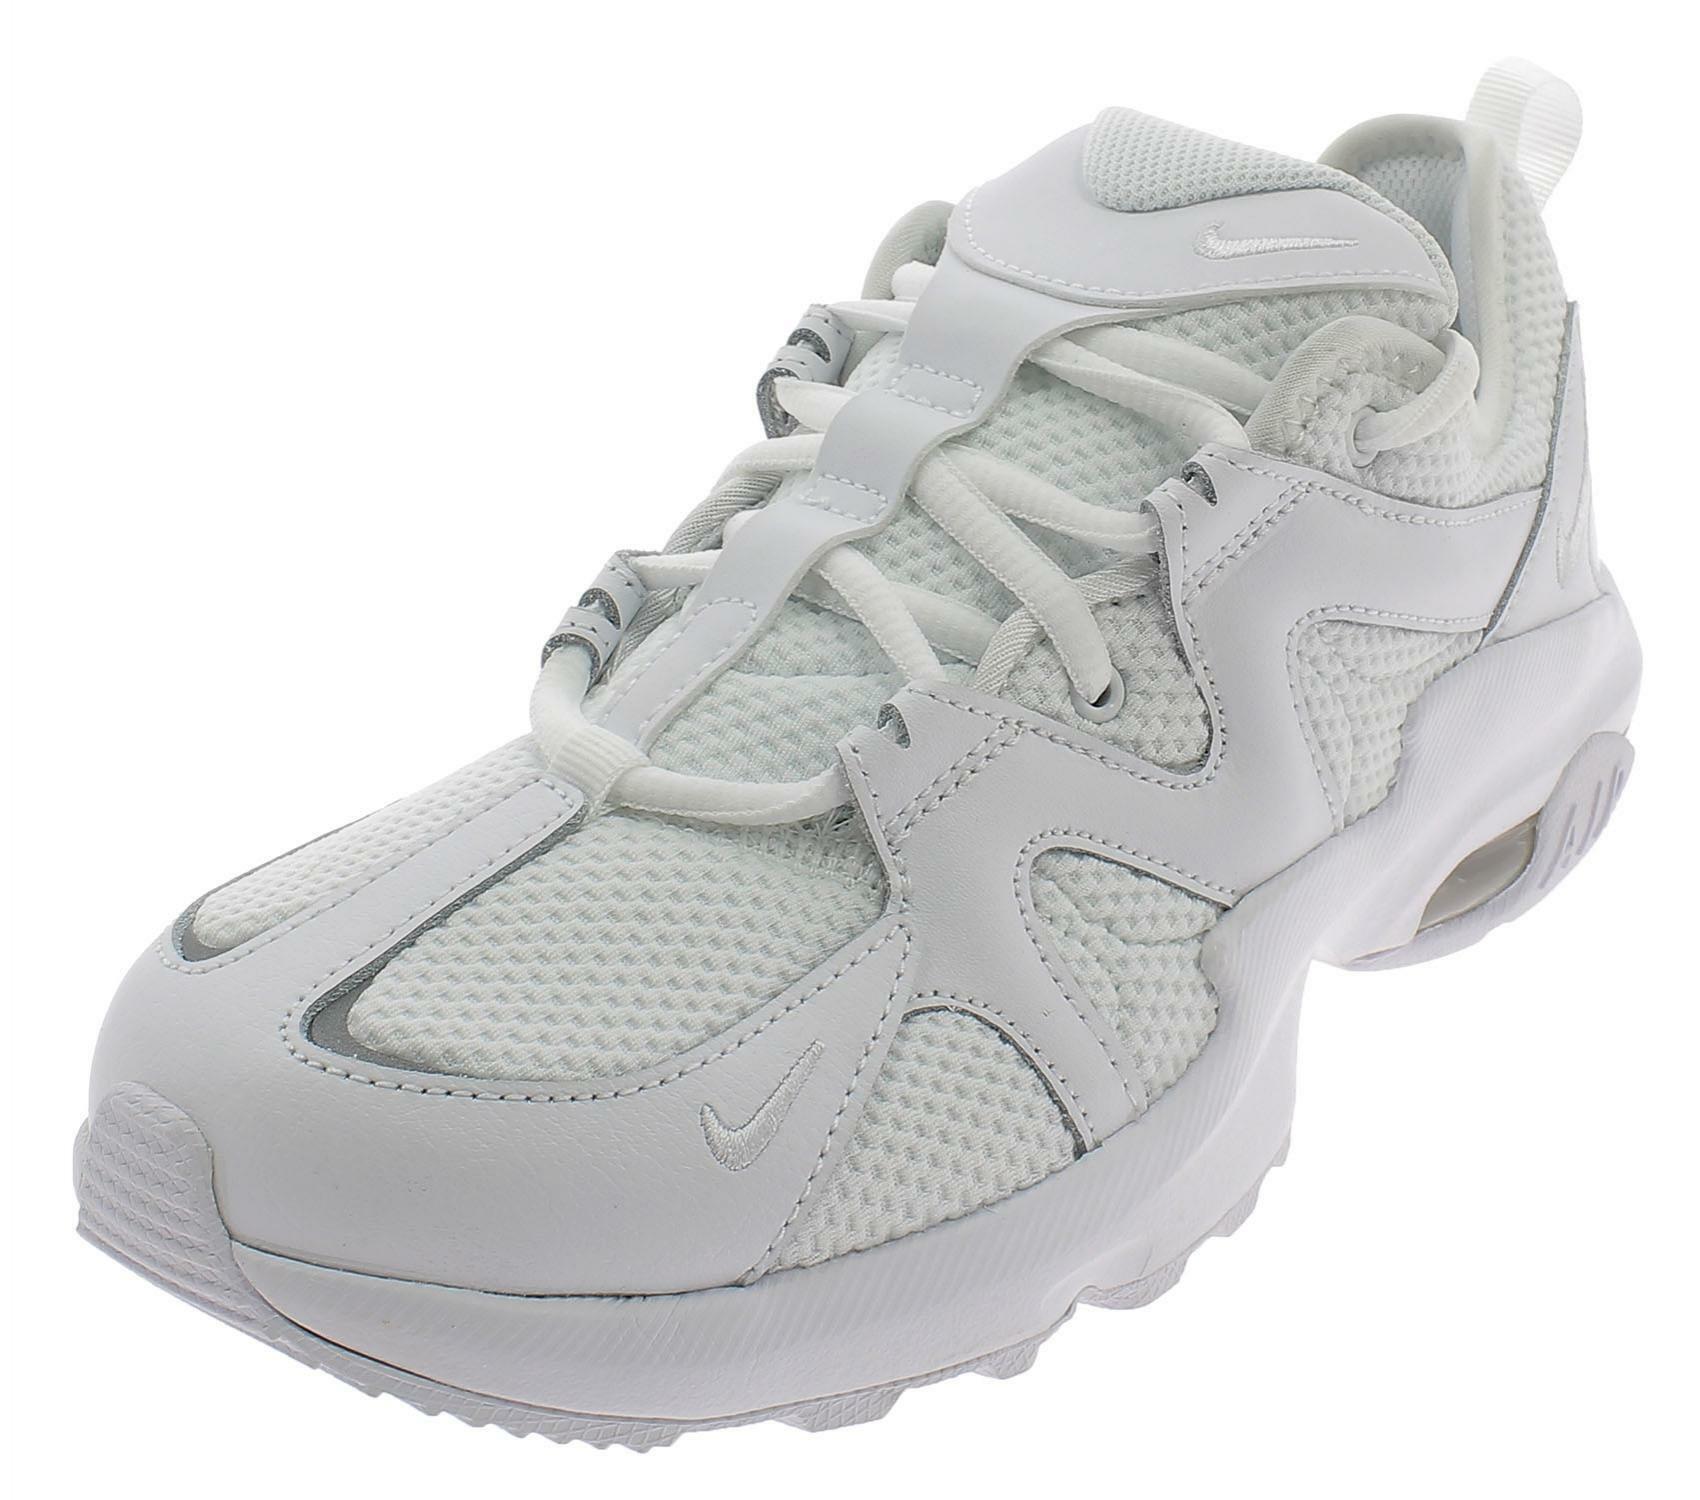 scarpe da ginnastica air max uomo